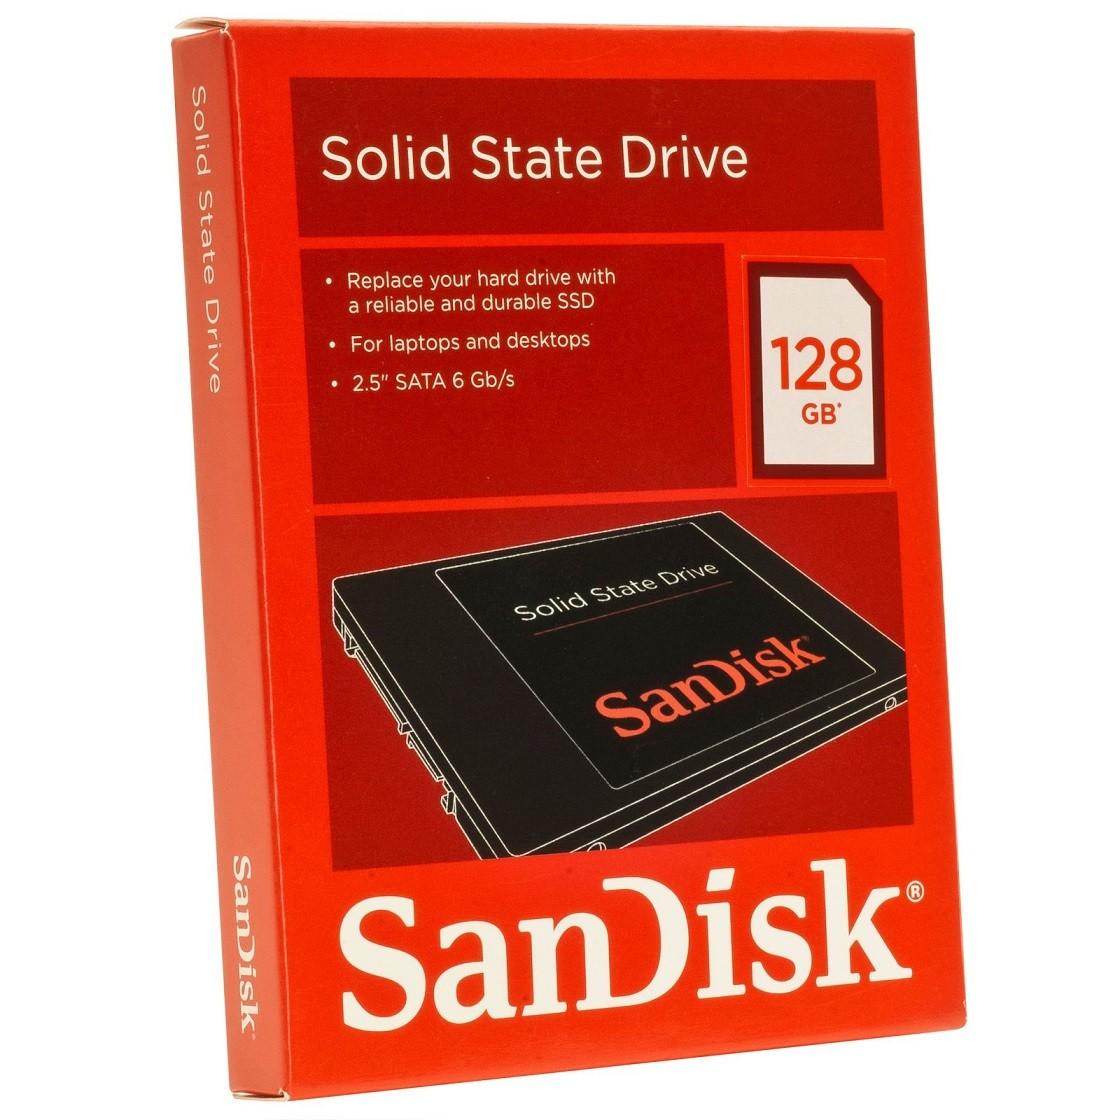 SSD 128GB Sata III 2.5 SDSSDP-128G-G25 - SanDisk